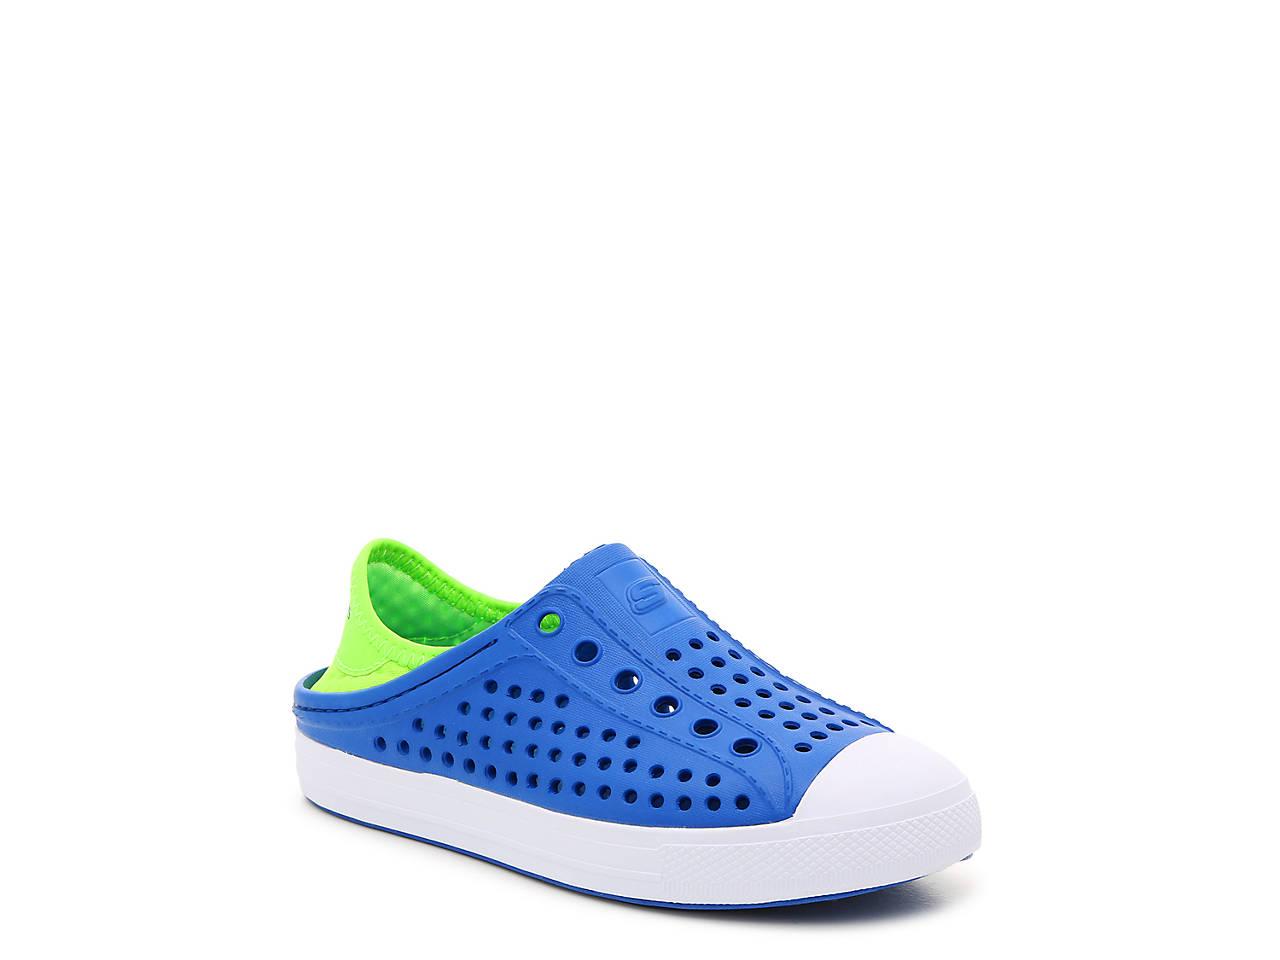 Guzman Steps Aqua Surge Slip-On Sneaker - Kids'